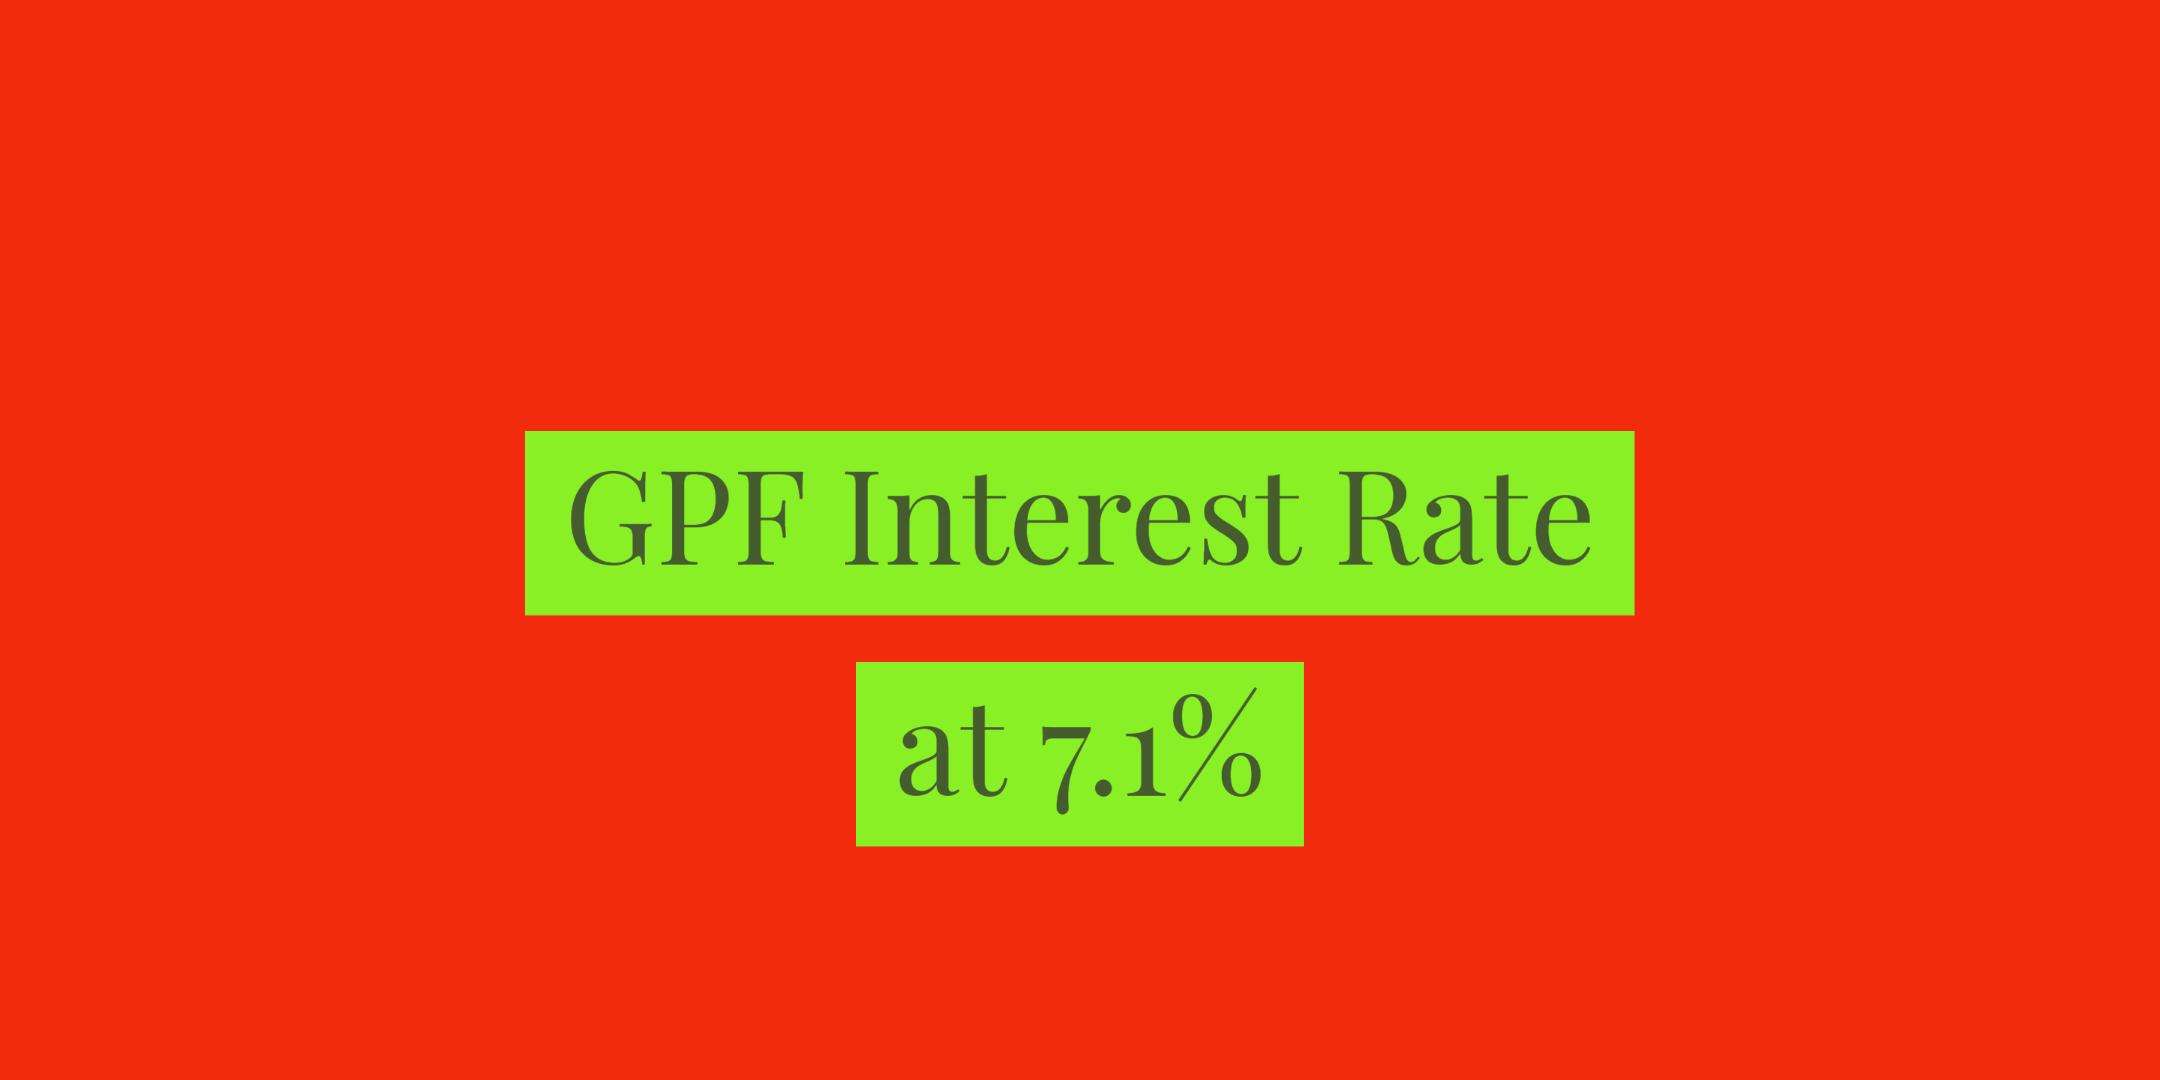 GPF Interest rate